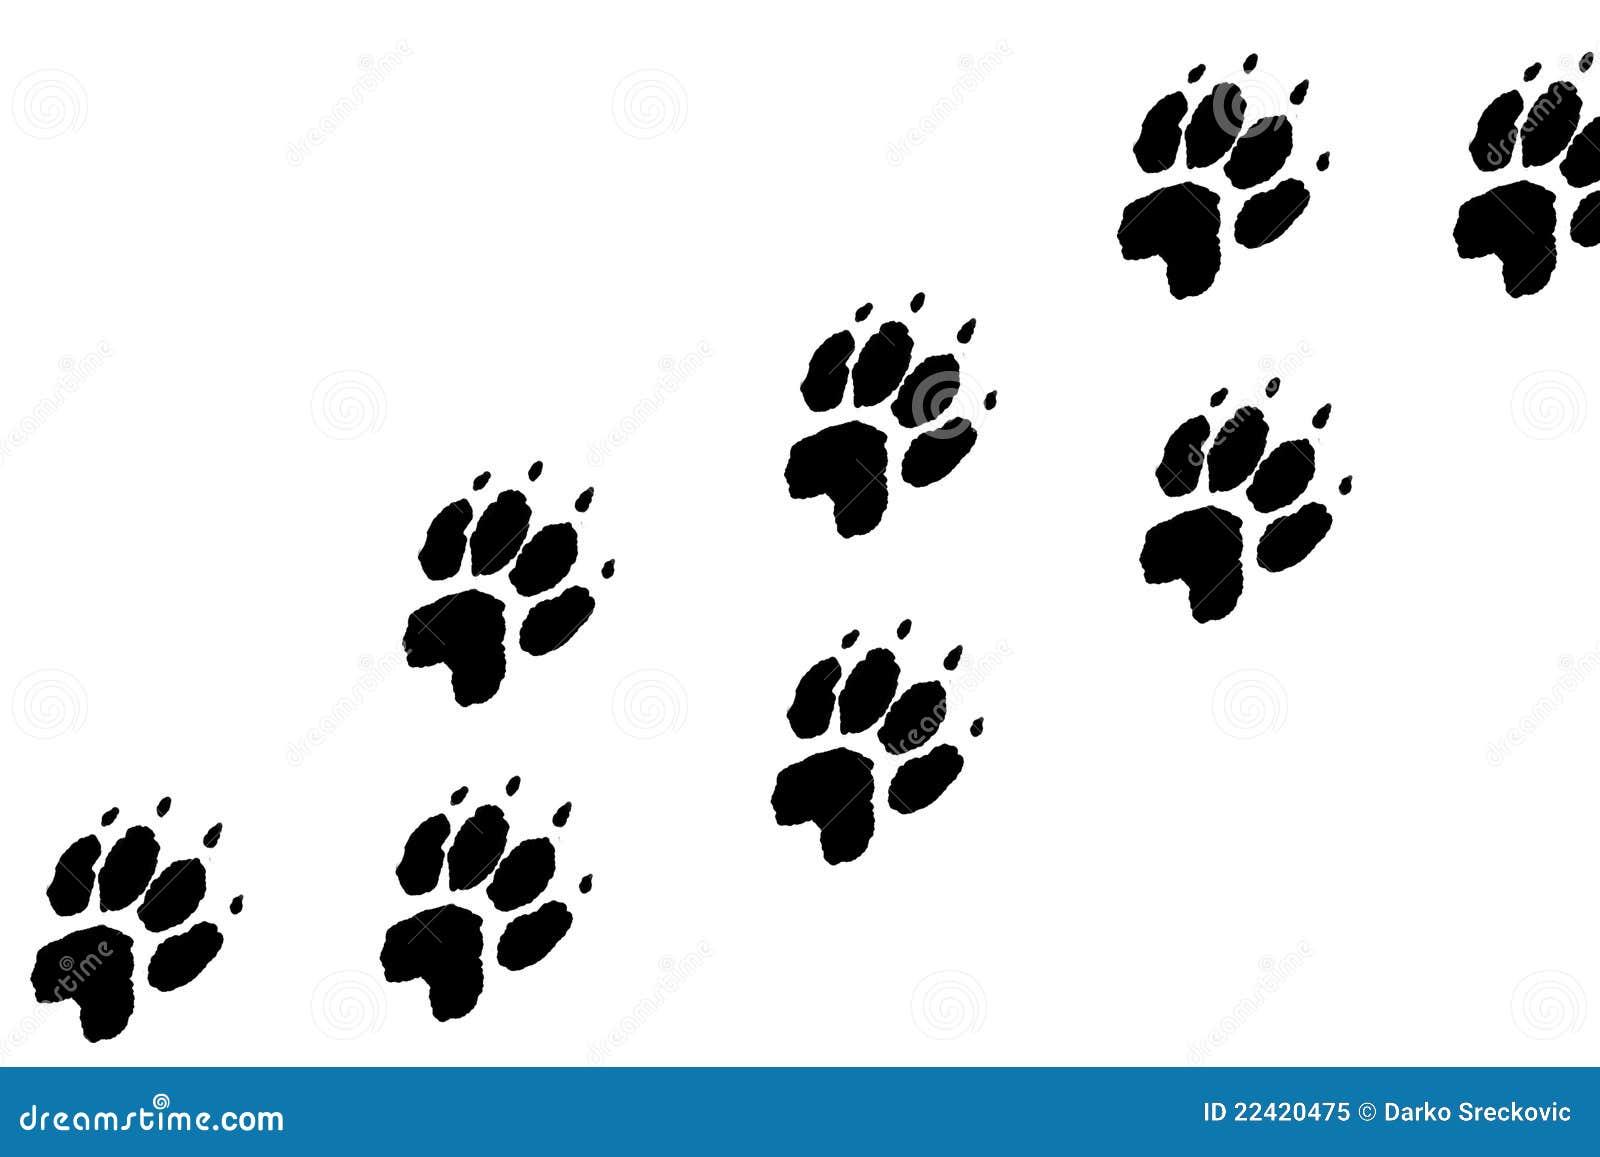 Paws Footprints Royalty Free Stock Photo Image 22420475